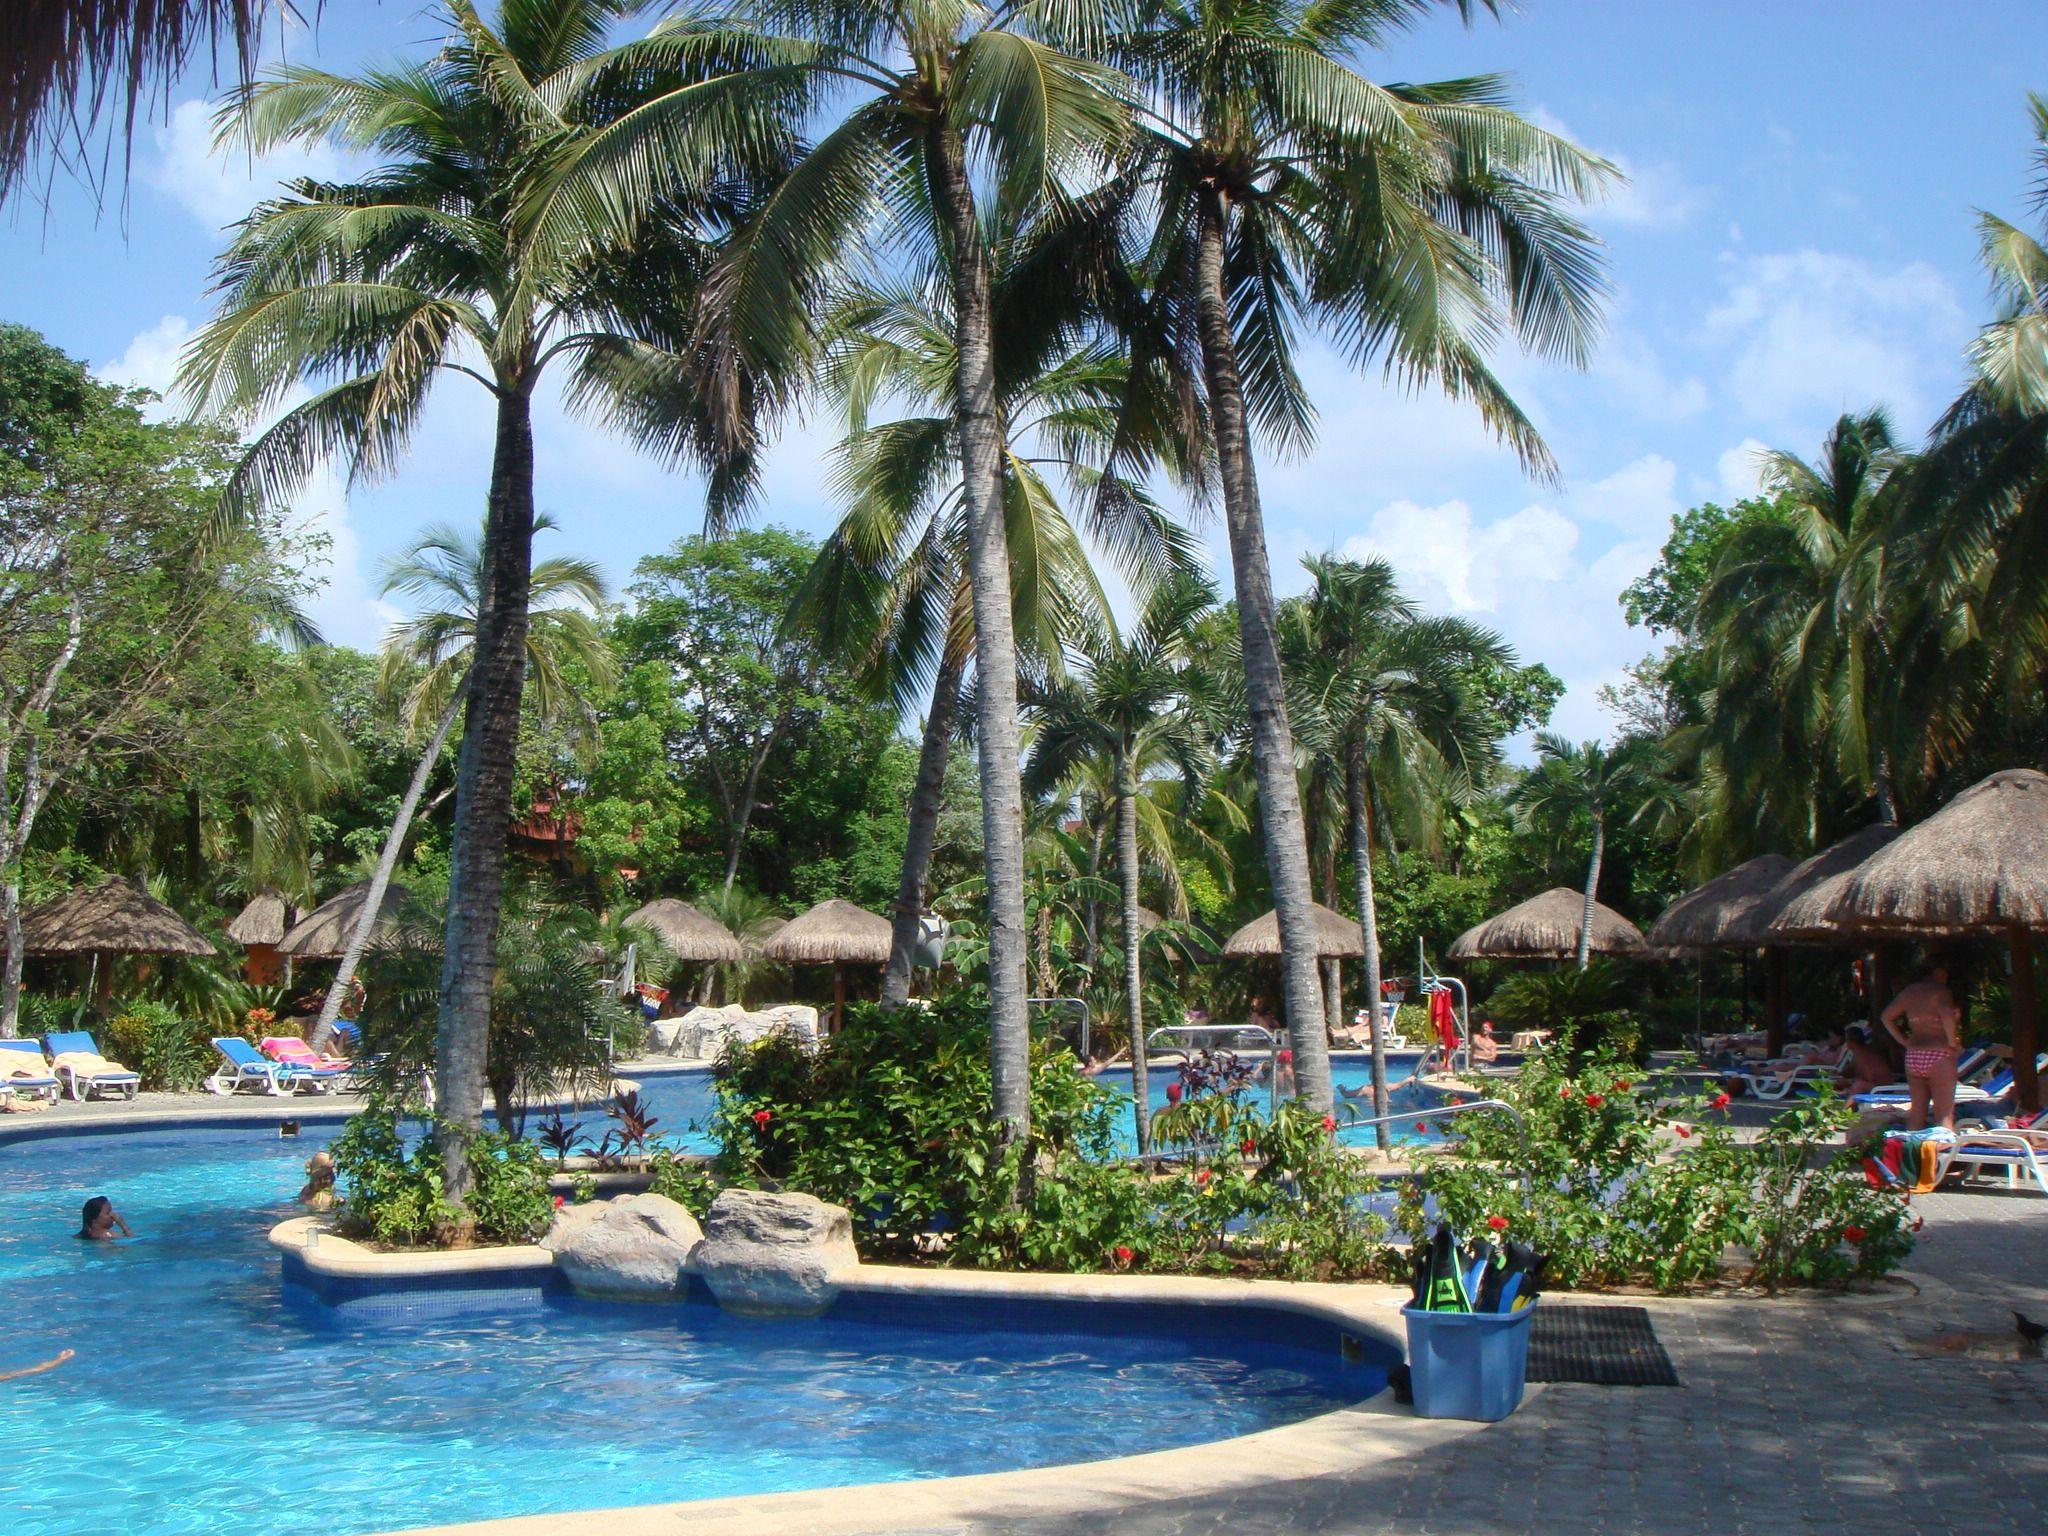 Hotel riu palace tres islas wellnesshotel strand van corralejo - Clubhotel Riu Tequila In Mexiko Mexico April 2017 Pinterest Tequila